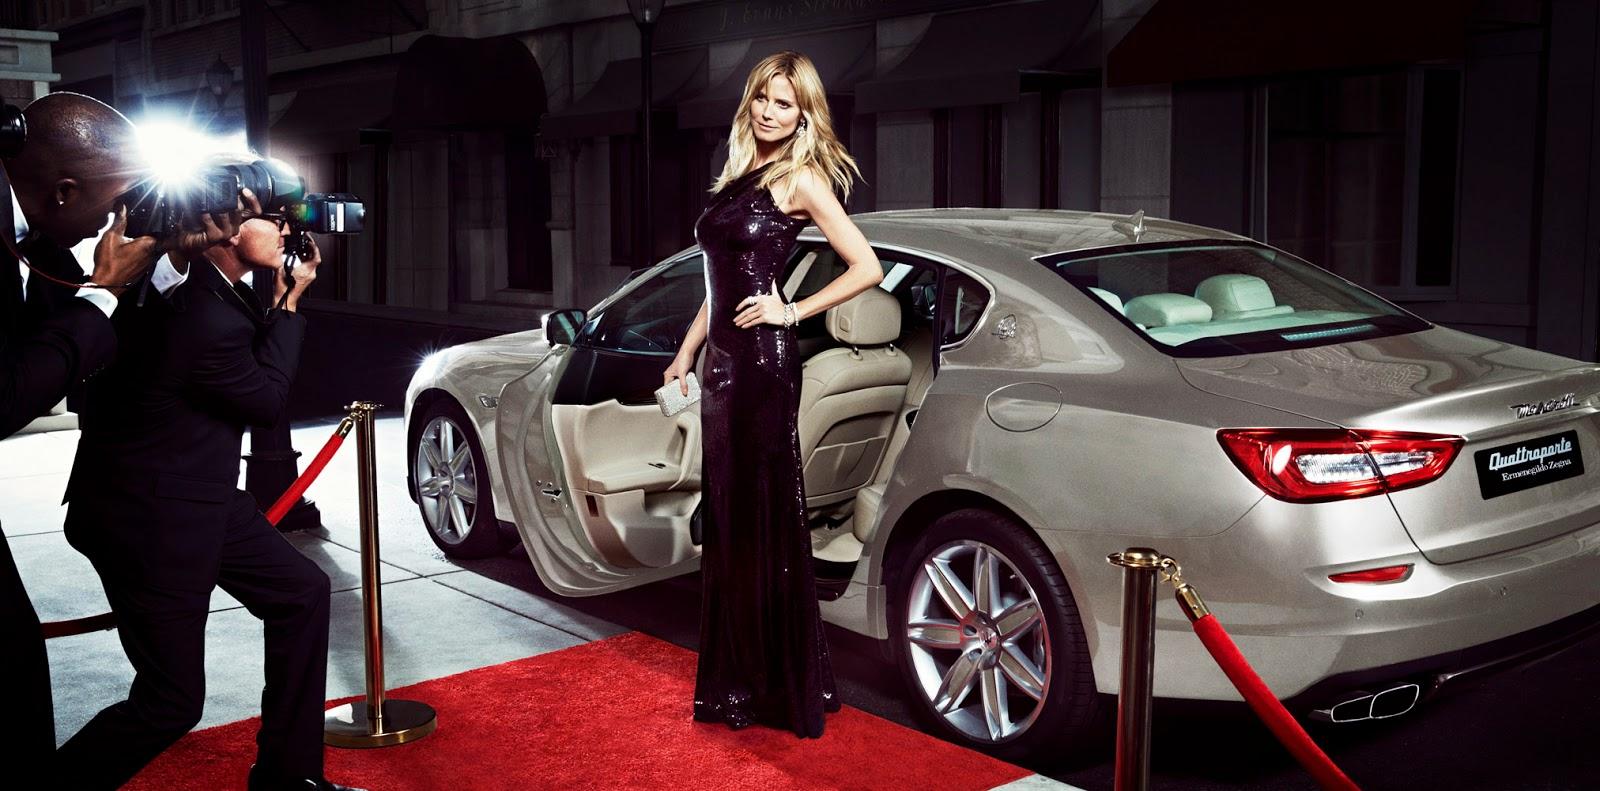 Heidi Klum for Maserati - TheGentlemanRacer.com